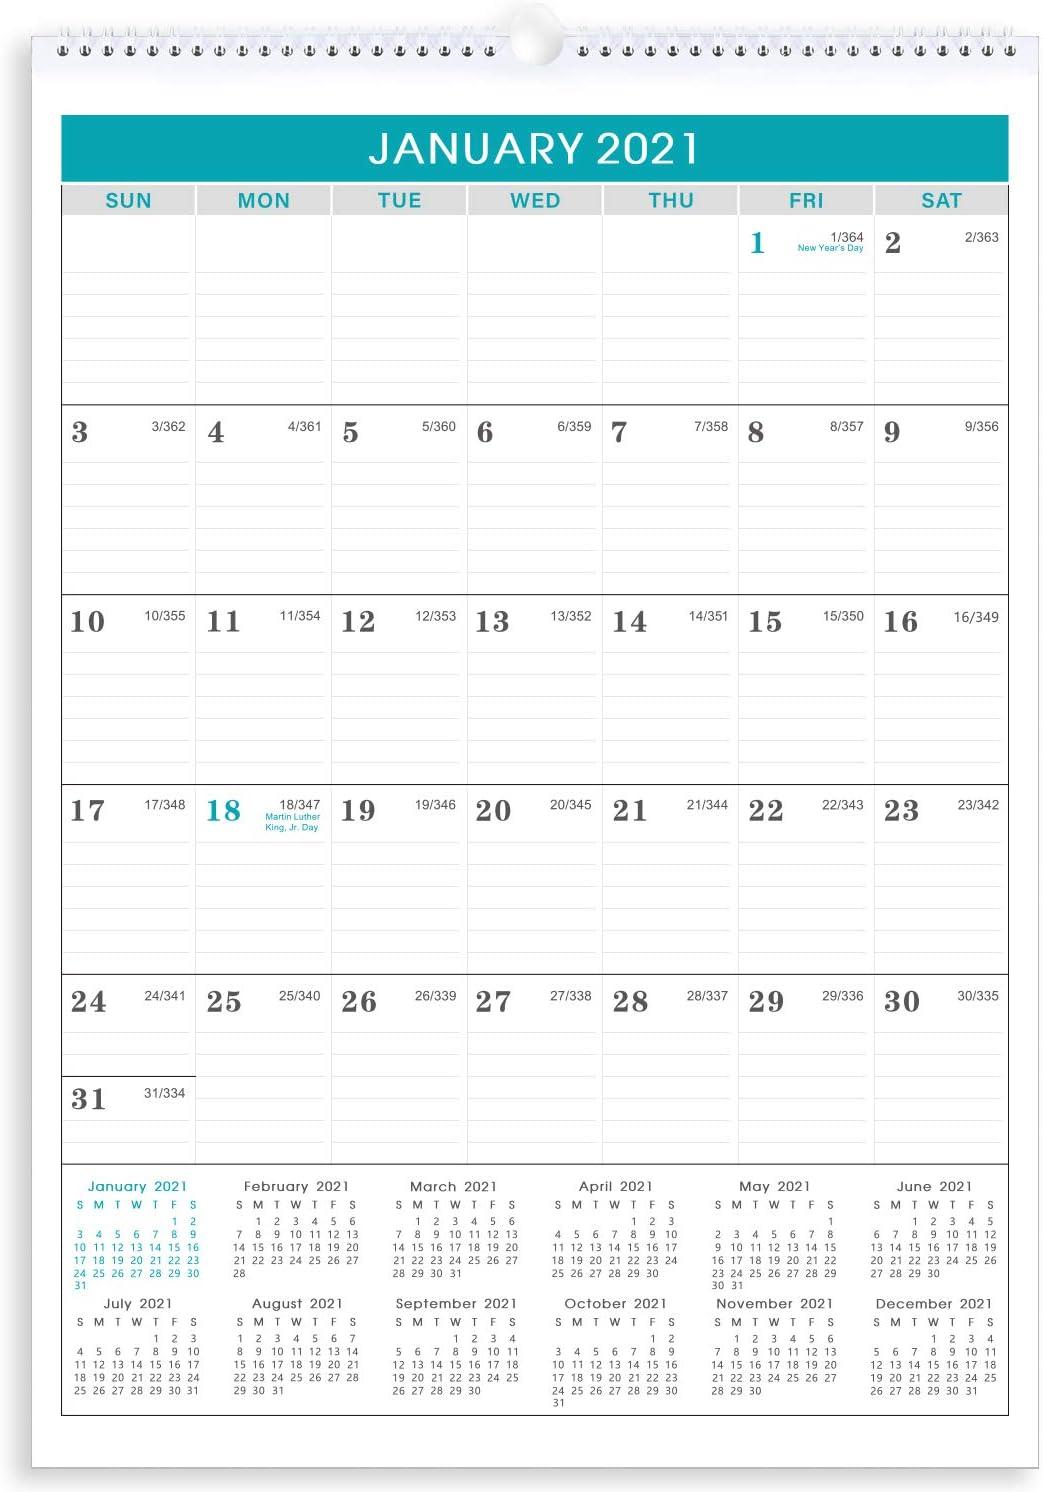 2022 Julian Calendar.Amazon Com 2021 2022 Calendar 18 Months 2021 2022 Wall Calendar With Julian Date 12 X 17 Jan 2021 Jun 2022 Premium Thick Paper Perfect For Organizing Planning Wirebound Ruled Daily Block Mint Office Products